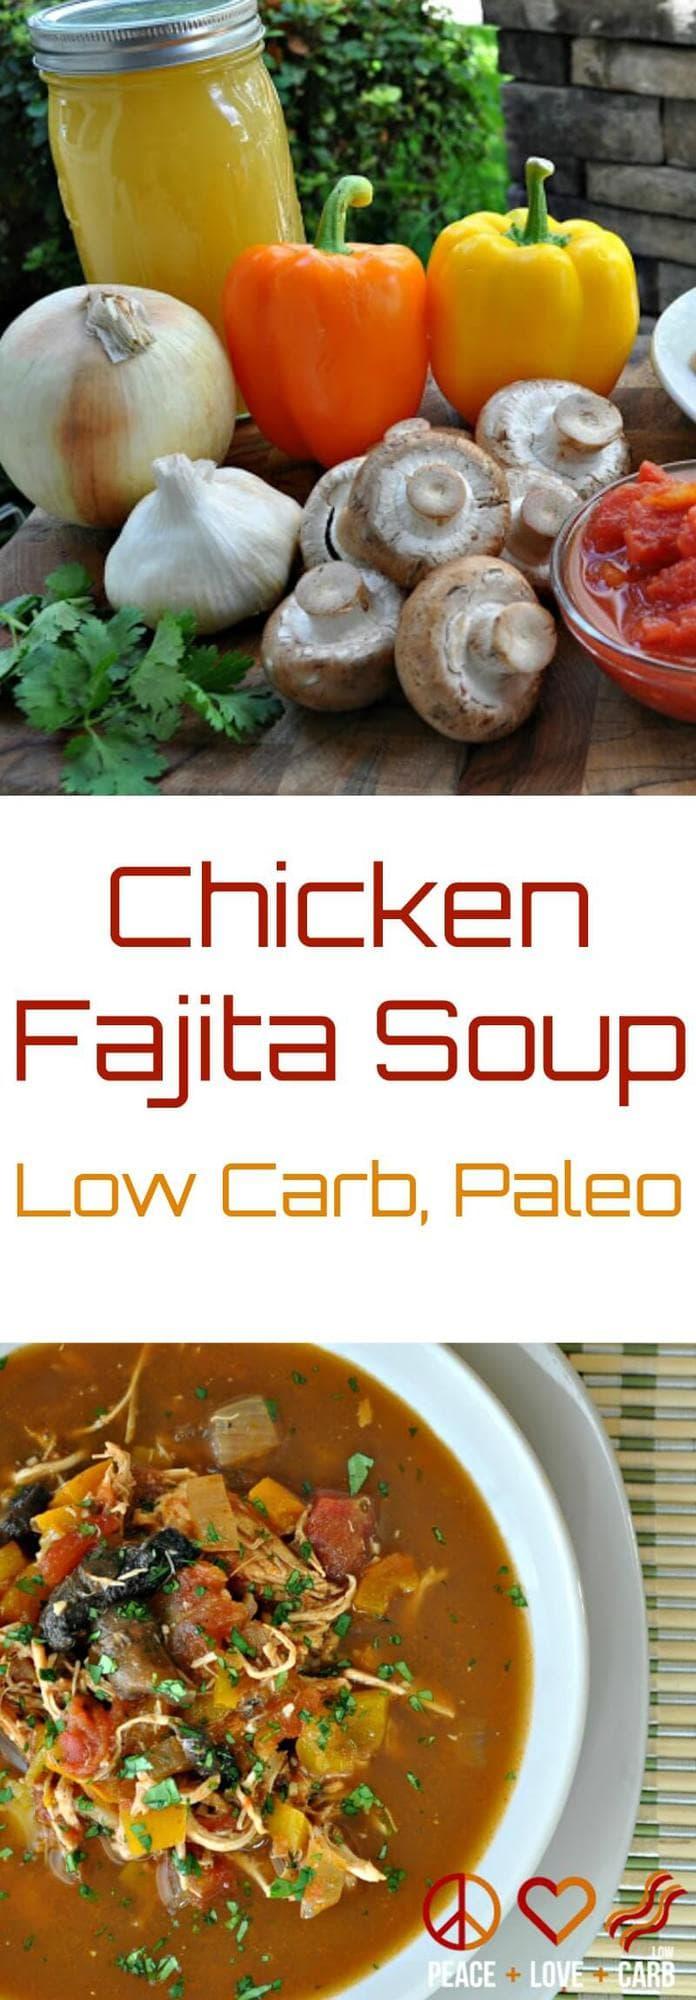 Chicken Fajita Soup | Peace Love and Low Carb #chickenfajitasoup #lowcarb #lowcarbsoup #lowcarbrecipe